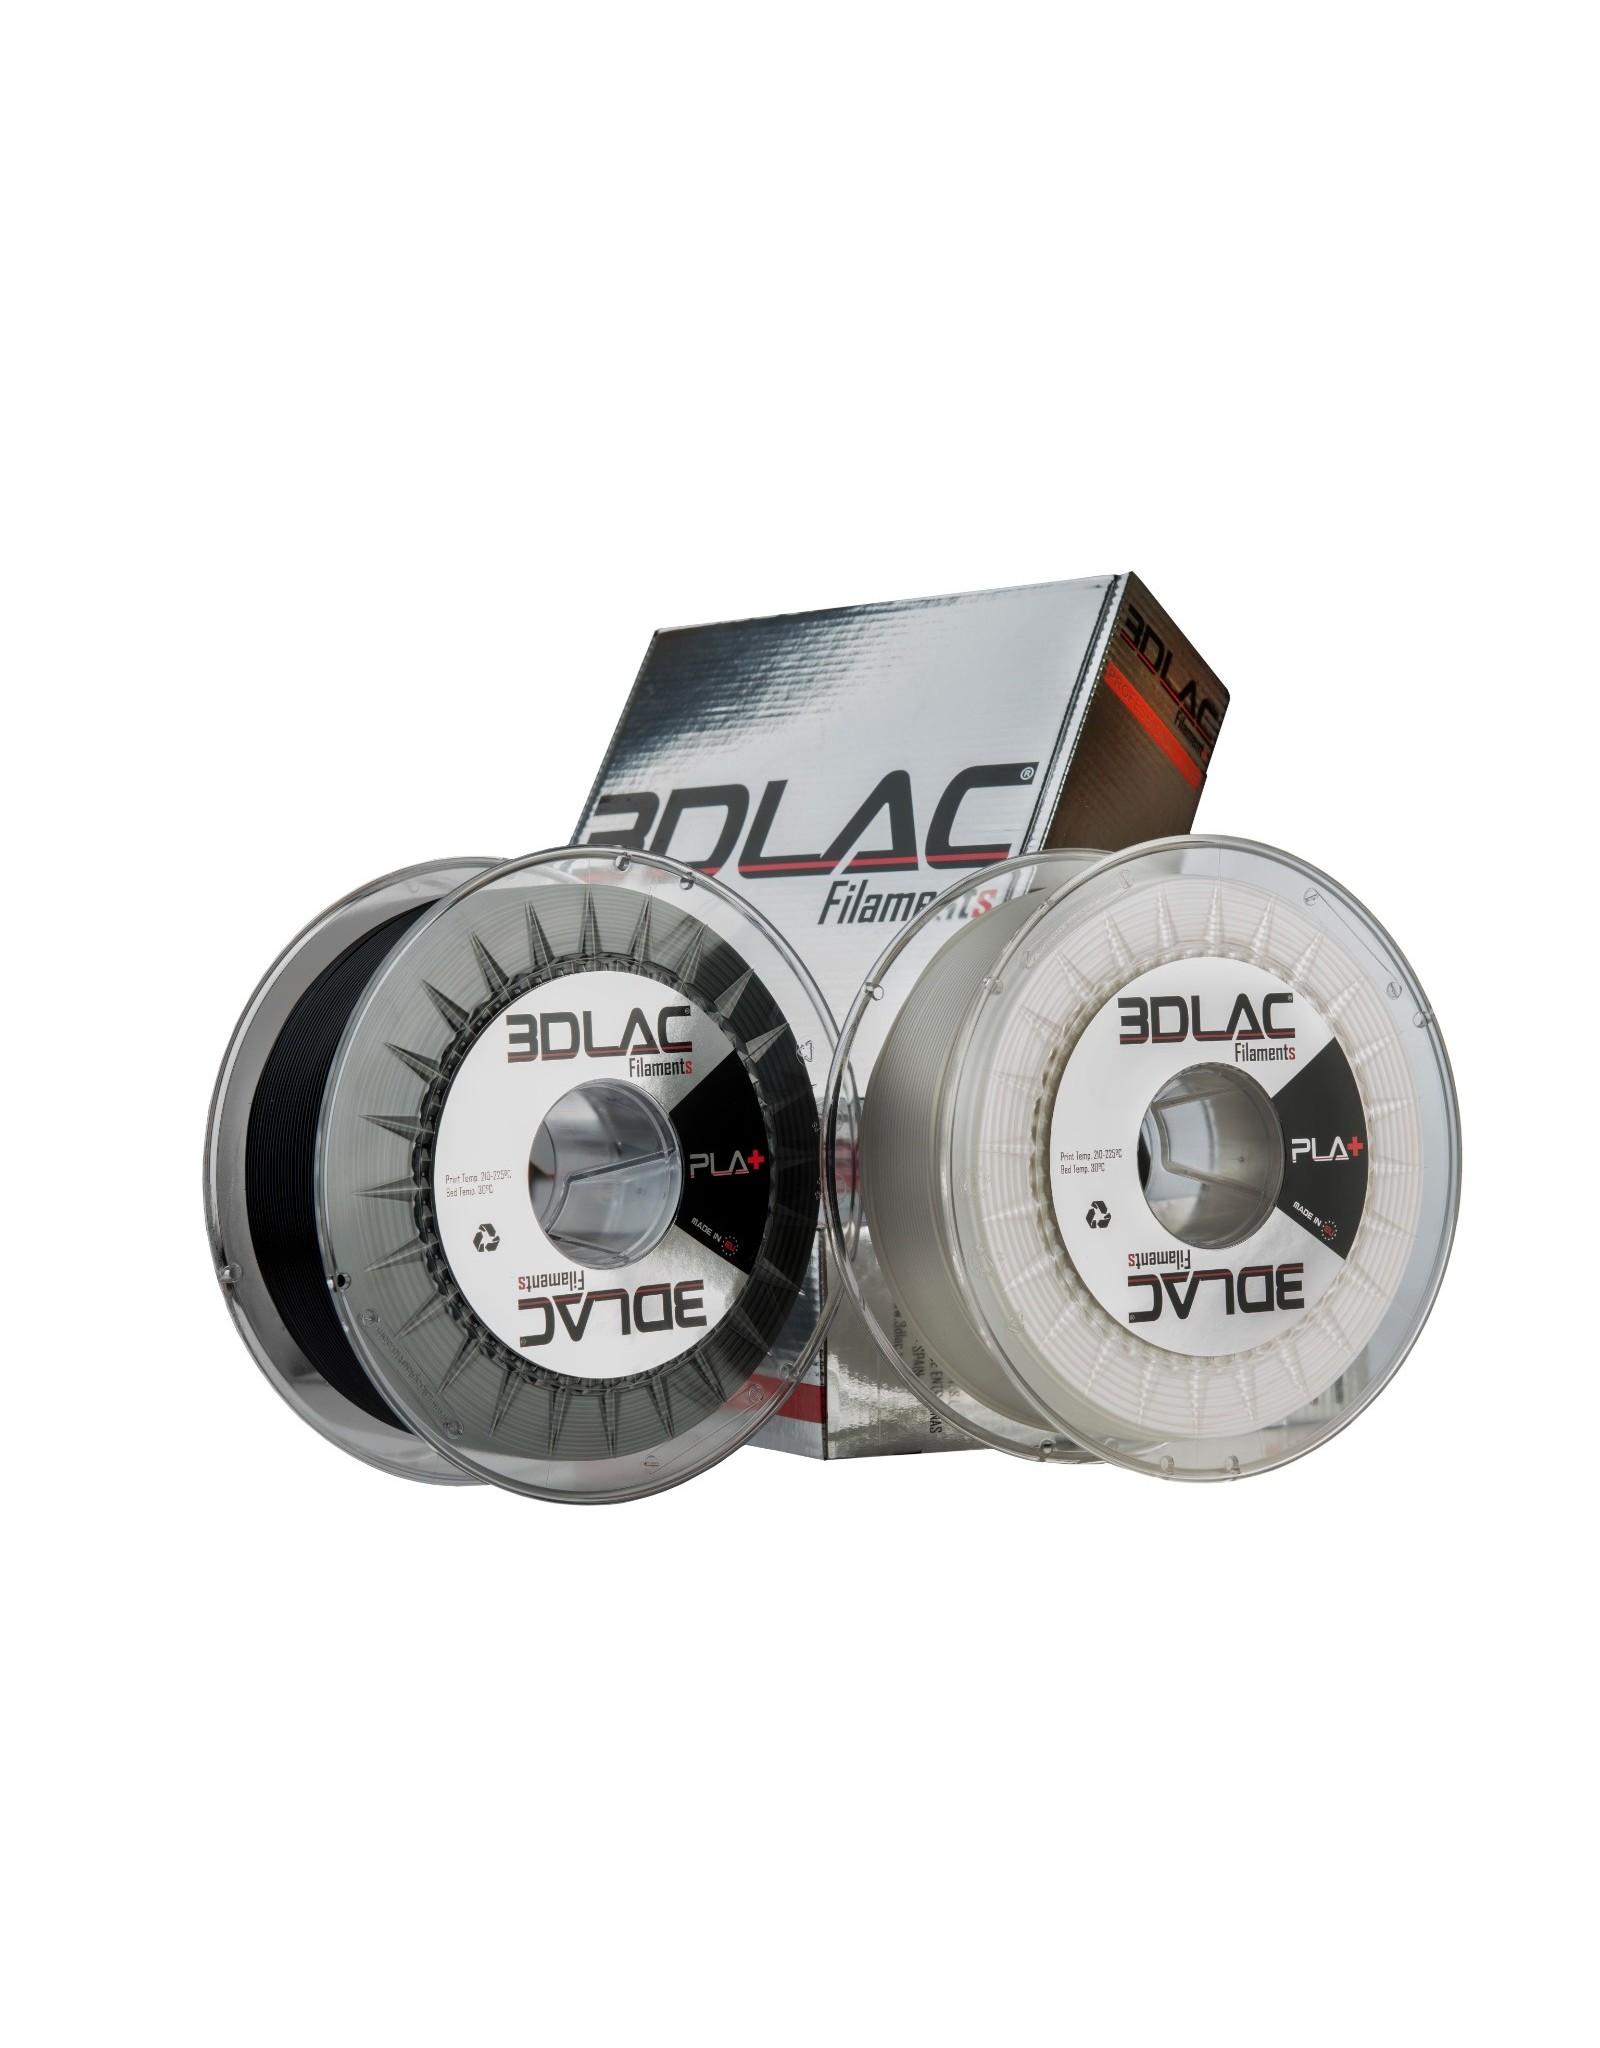 3DLAC 3DLAC Pla zwart filament